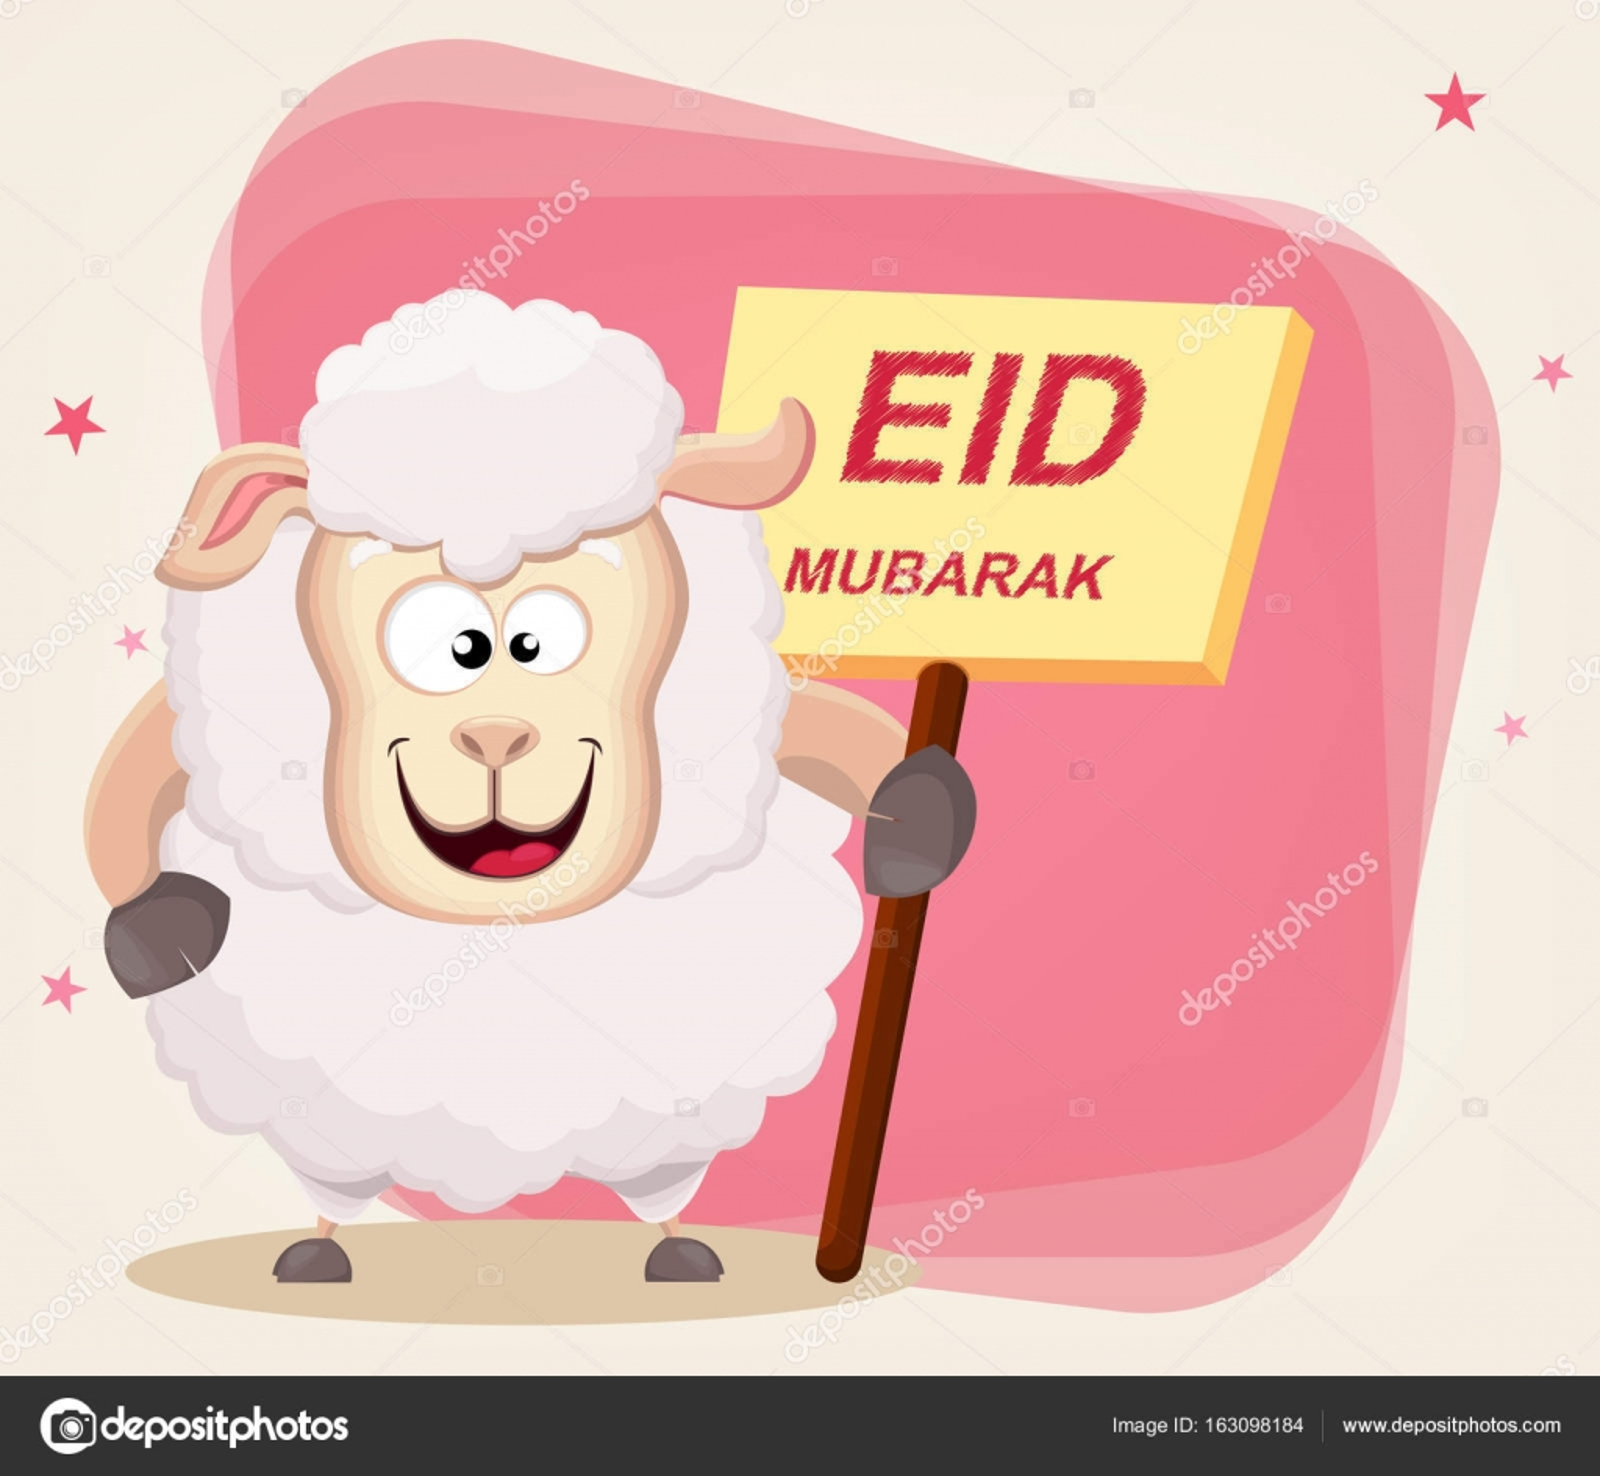 Good Id Festival Eid Al-Fitr Greeting - depositphotos_163098184-stock-illustration-eid-mubarak-traditional-muslim-greeting  Collection_861528 .jpg